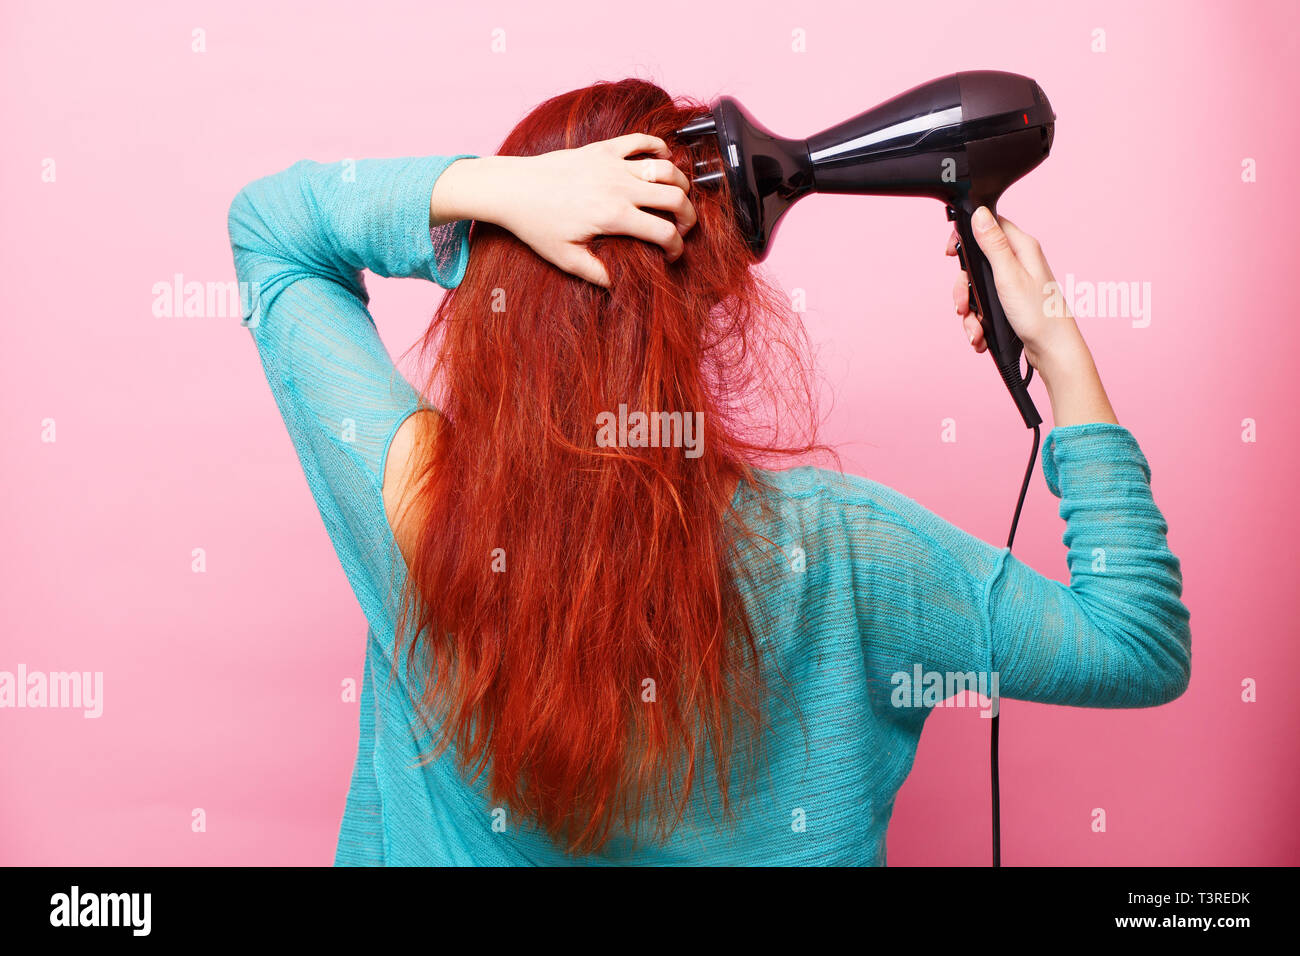 Secador de pelo color rosa